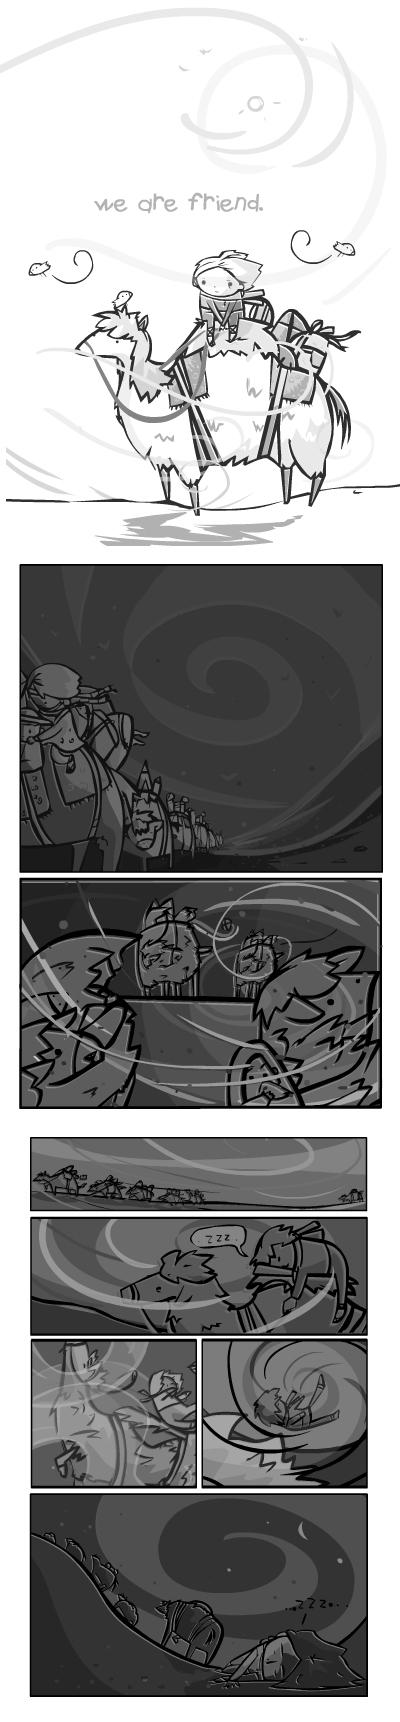 we are friend : mini comic 1 by RayArray